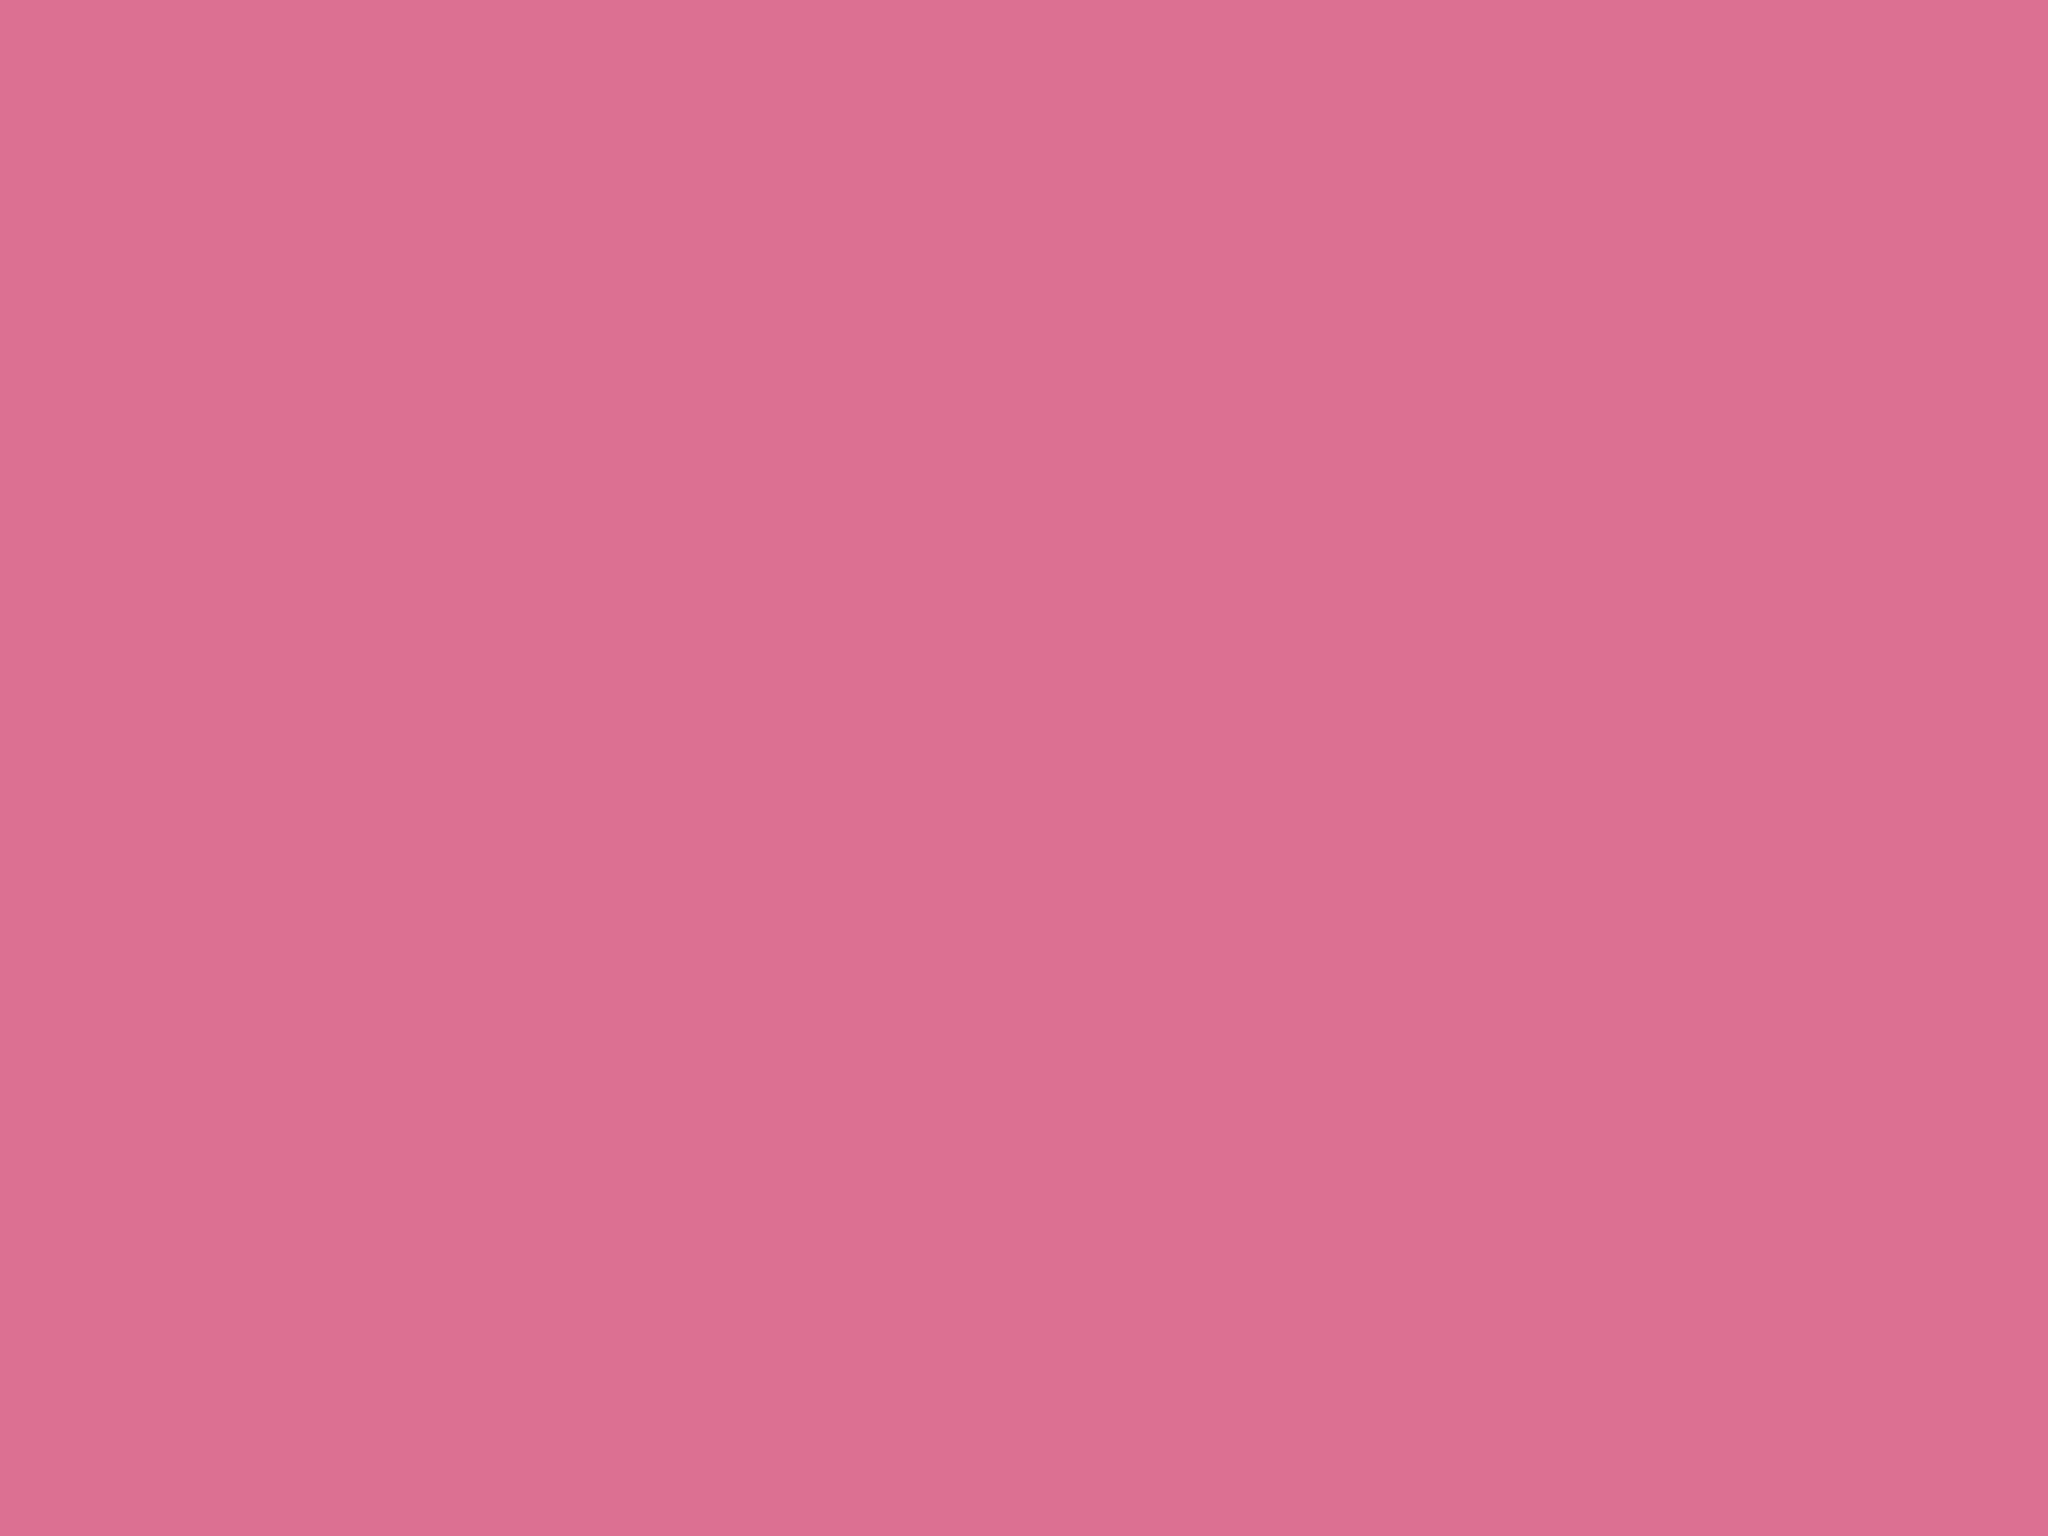 2048x1536 Pale Violet-red Solid Color Background